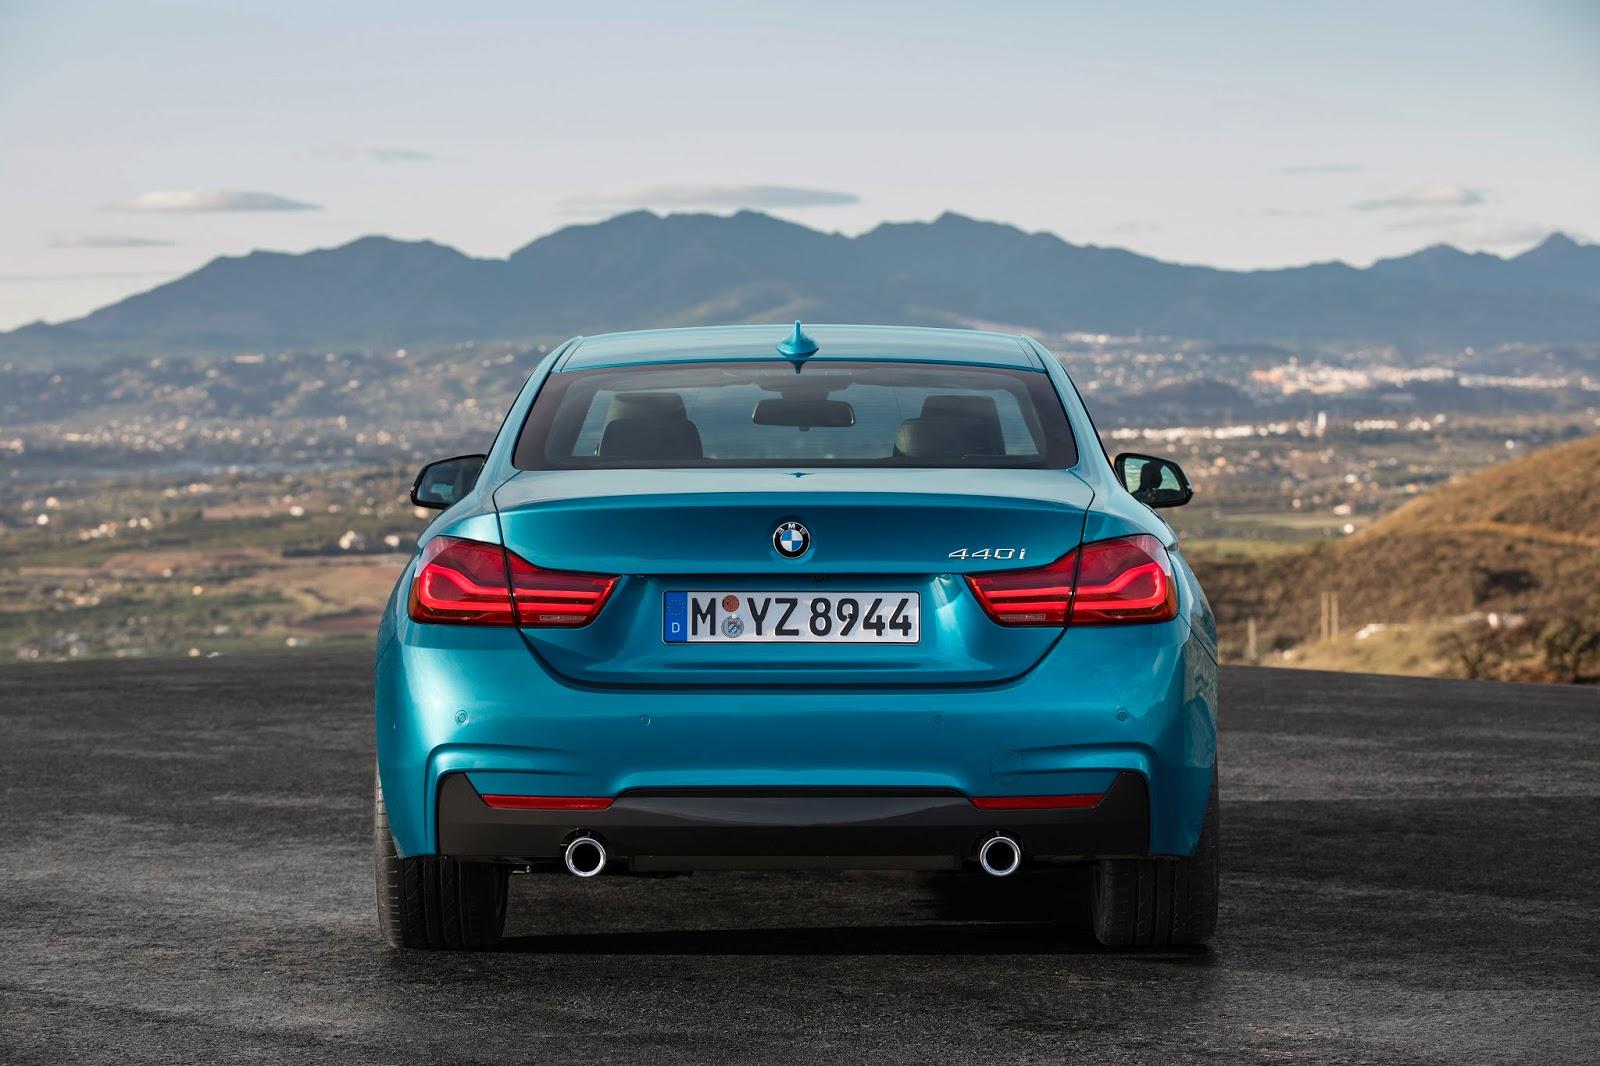 P90245207 highRes bmw 4 series m sport Η νέα BMW Σειρά 4, με πιο σφιχτή ρύθμιση ανάρτησης BMW, Bmw 4, BMW 4 Cabrio, BMW 4 Coupe, BMW 4 Gran Coupé, Facelift